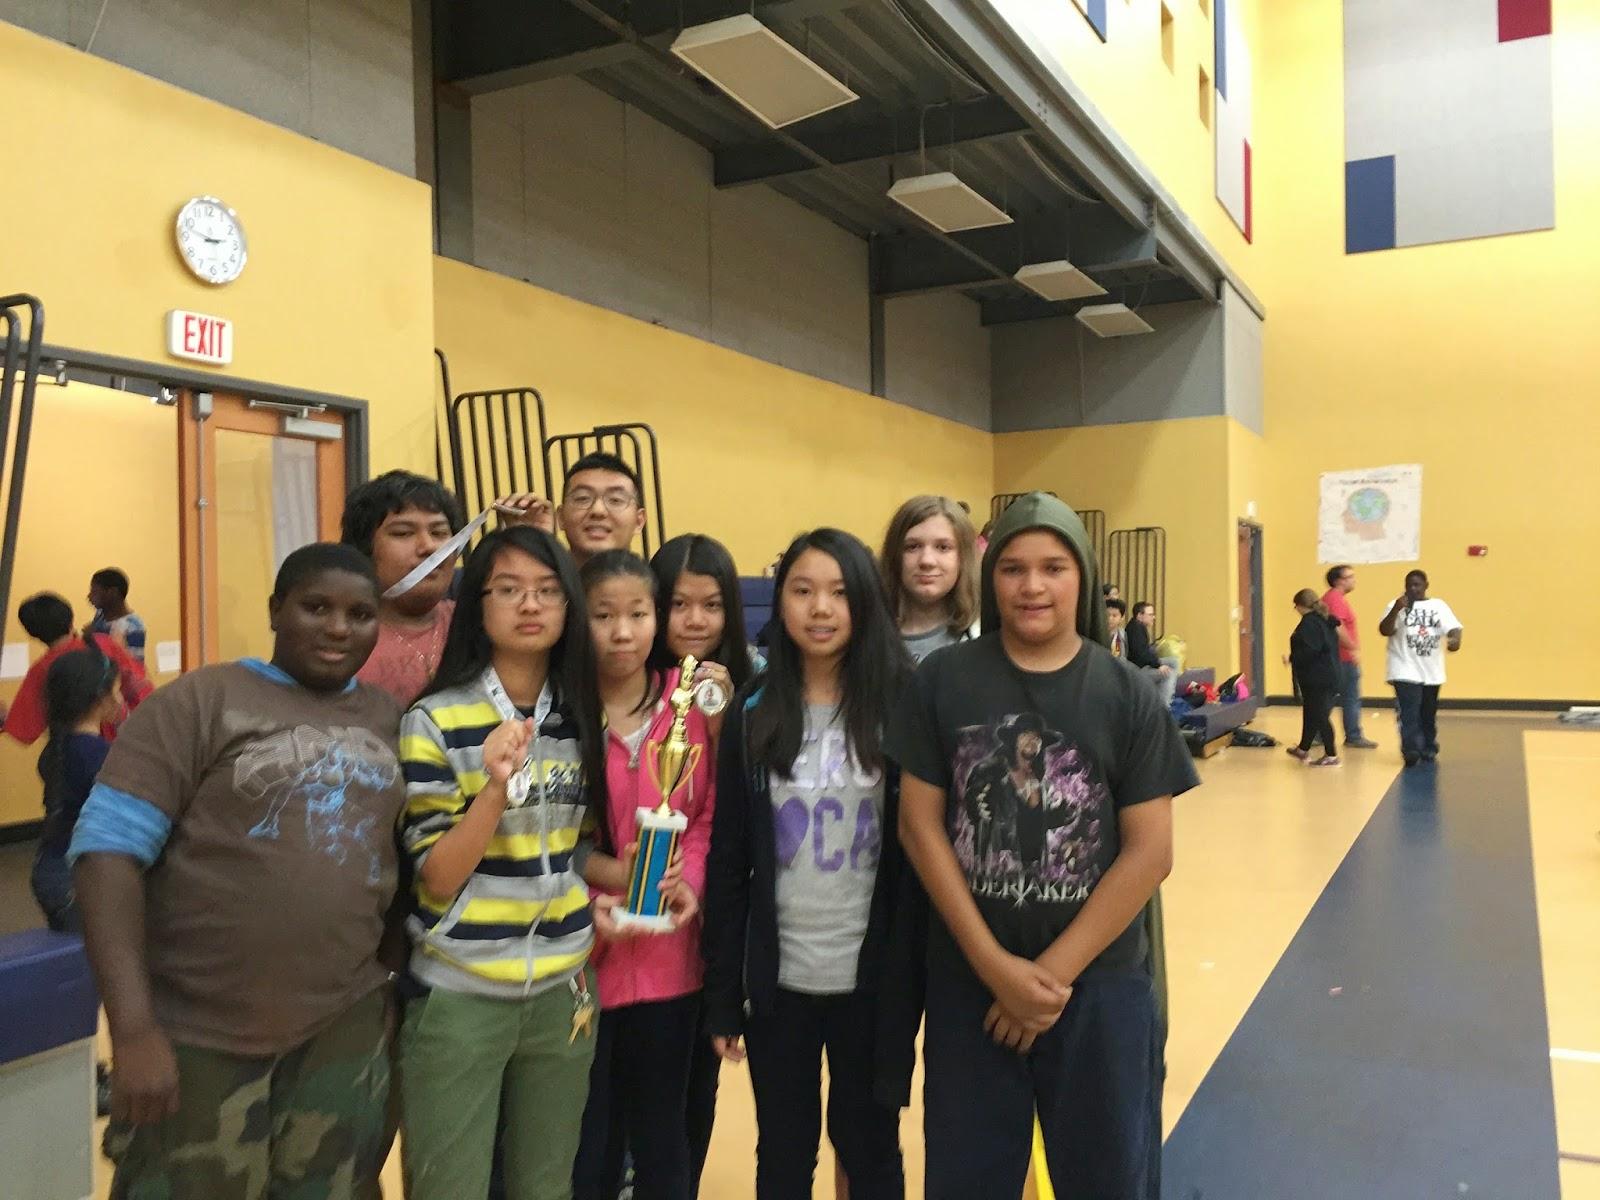 Southwark's Chess Team Brings Home the Silver! | Southwark School K-8